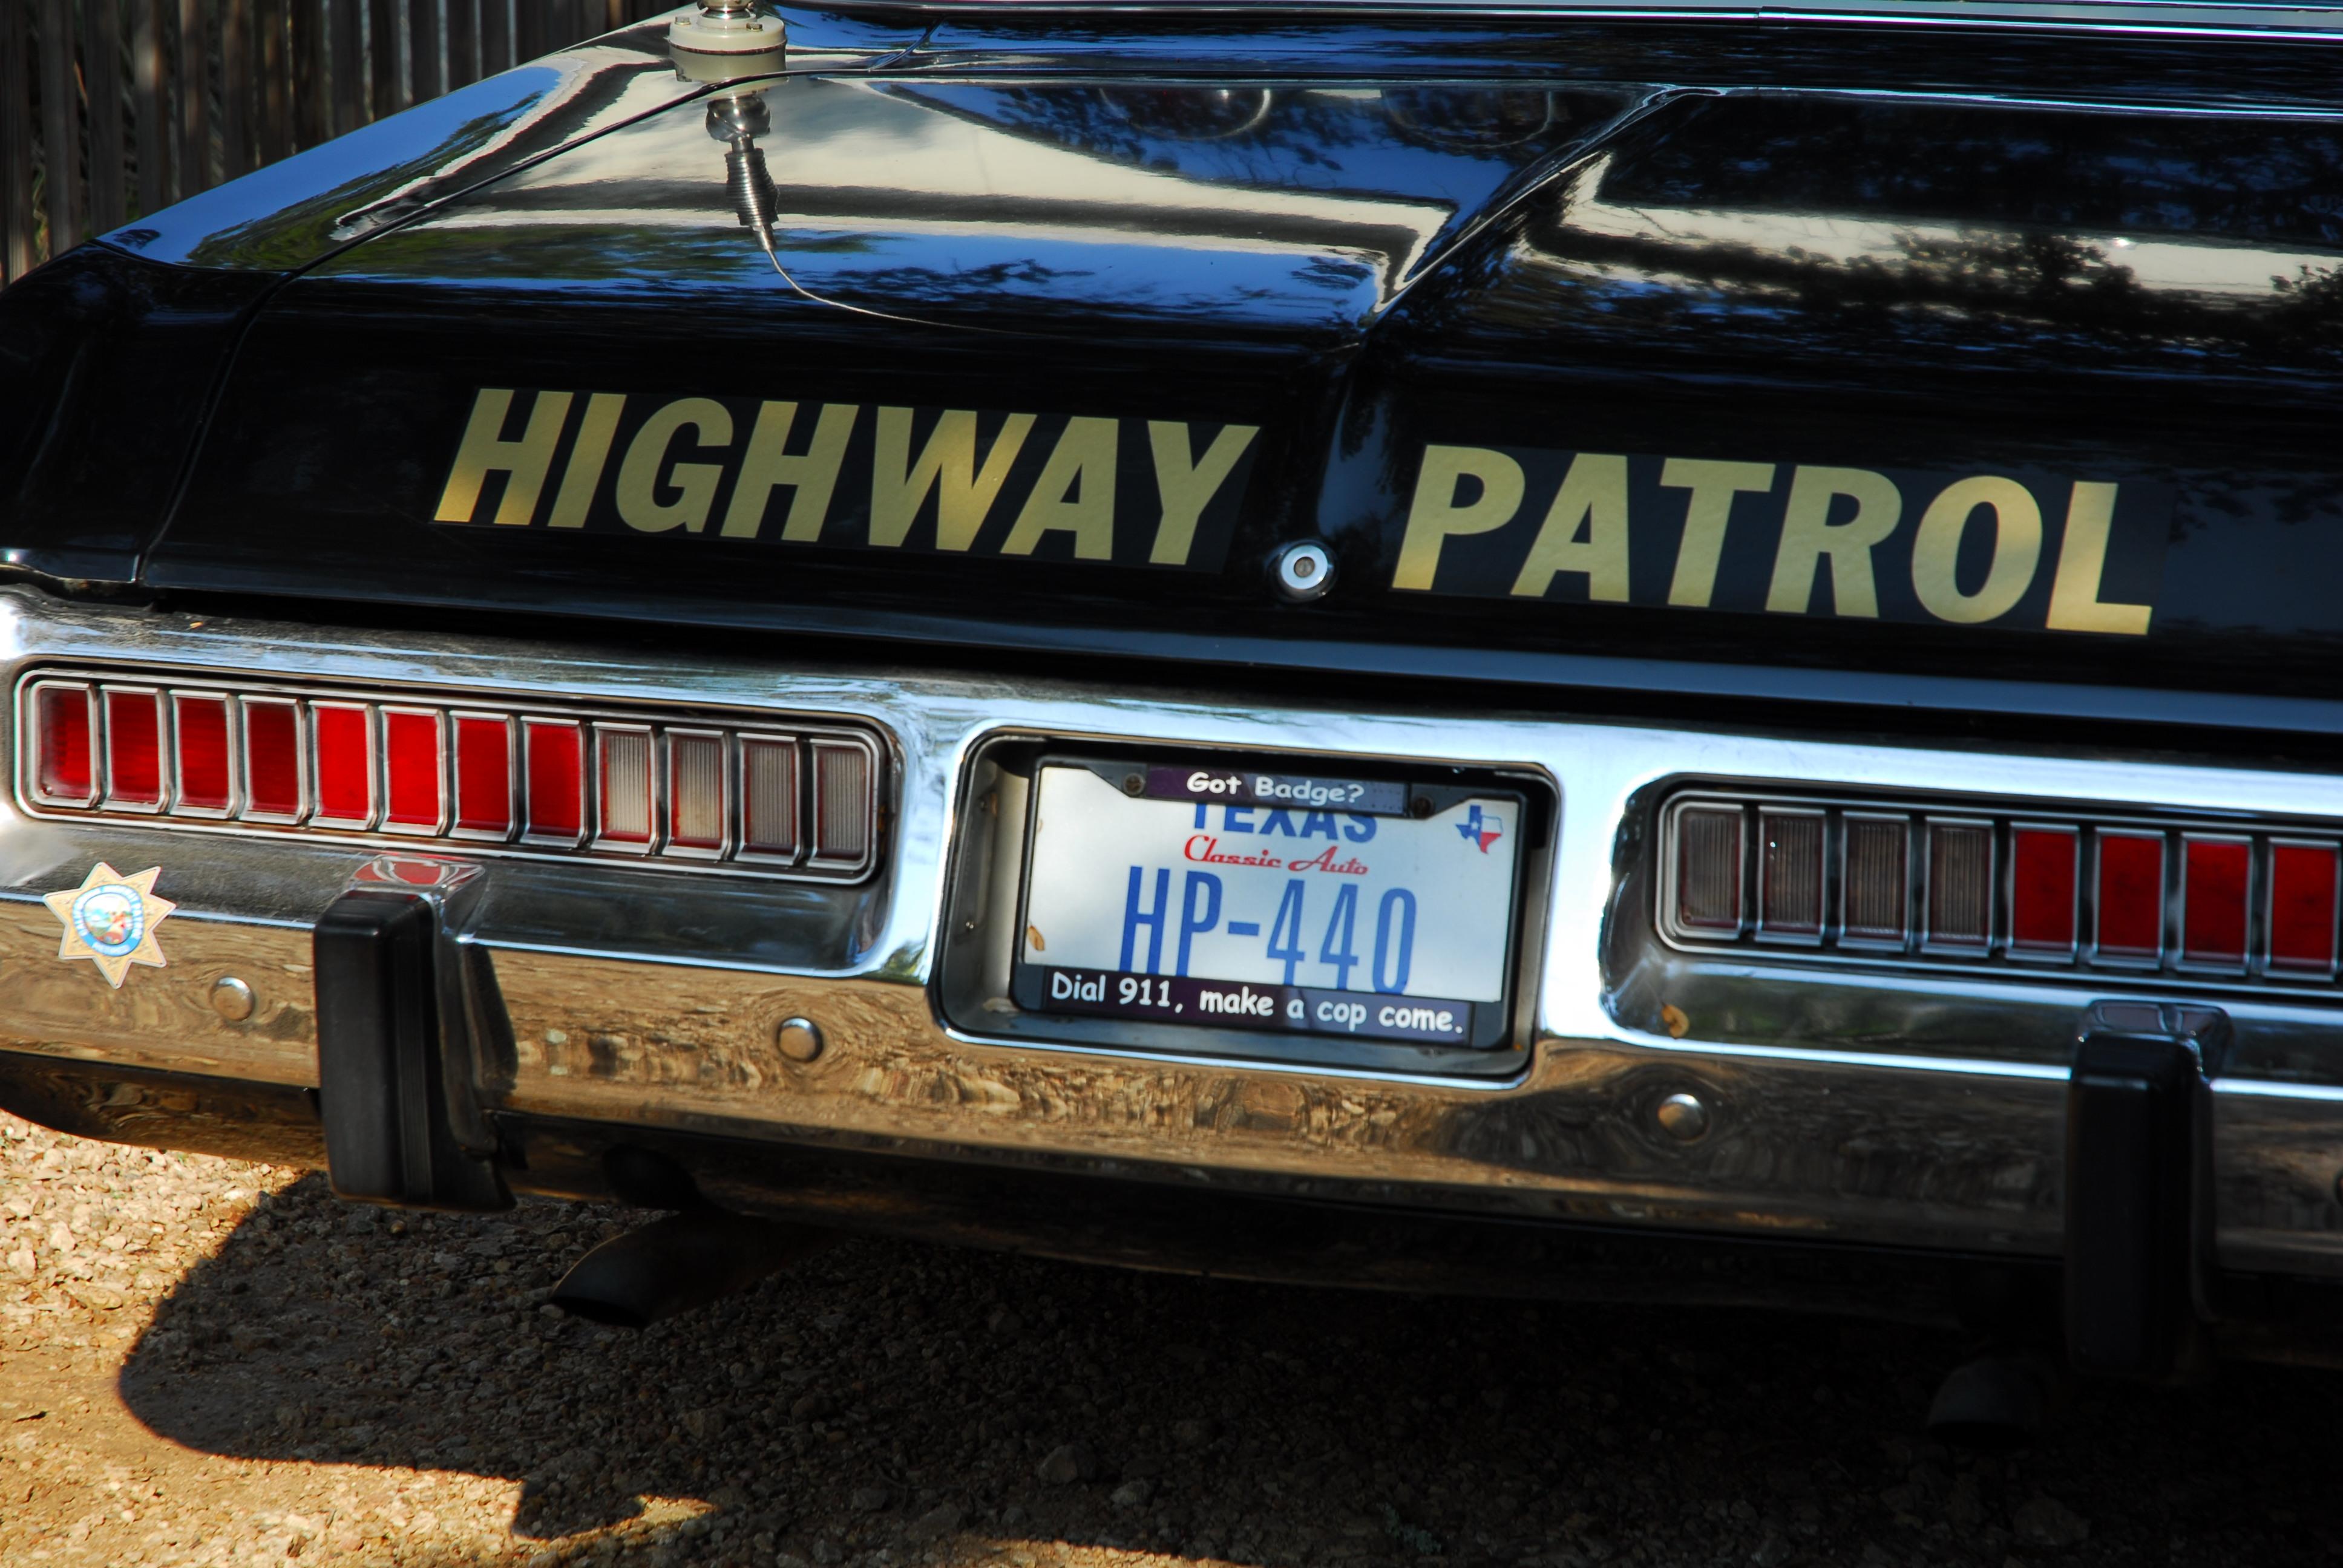 ponch   david kumhyr s 1973 dodge polara california highway patrol car